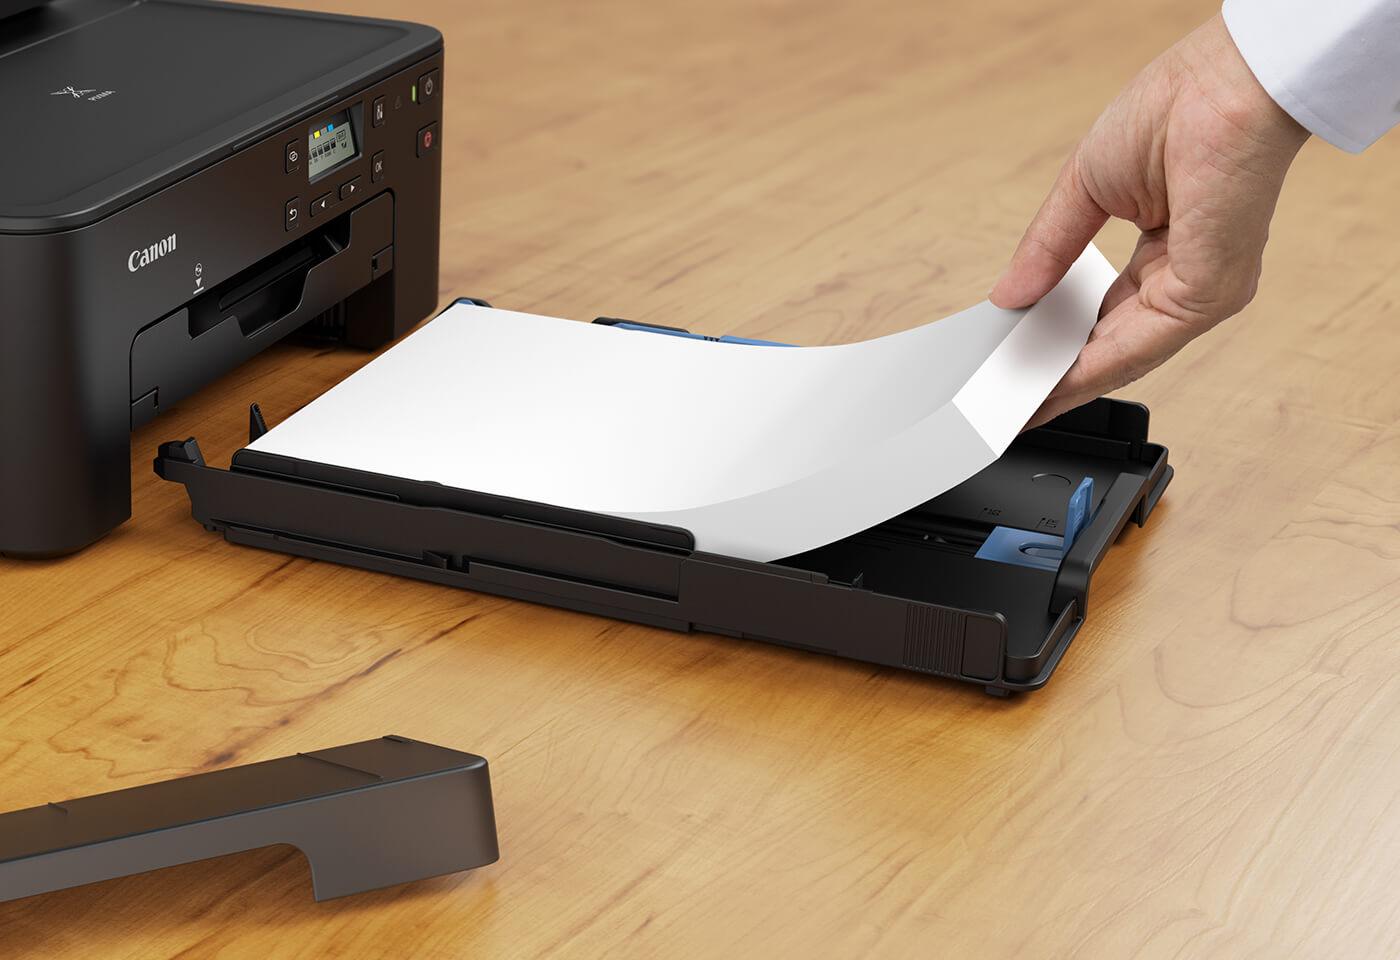 Loading paper tray on PIXMA TS706